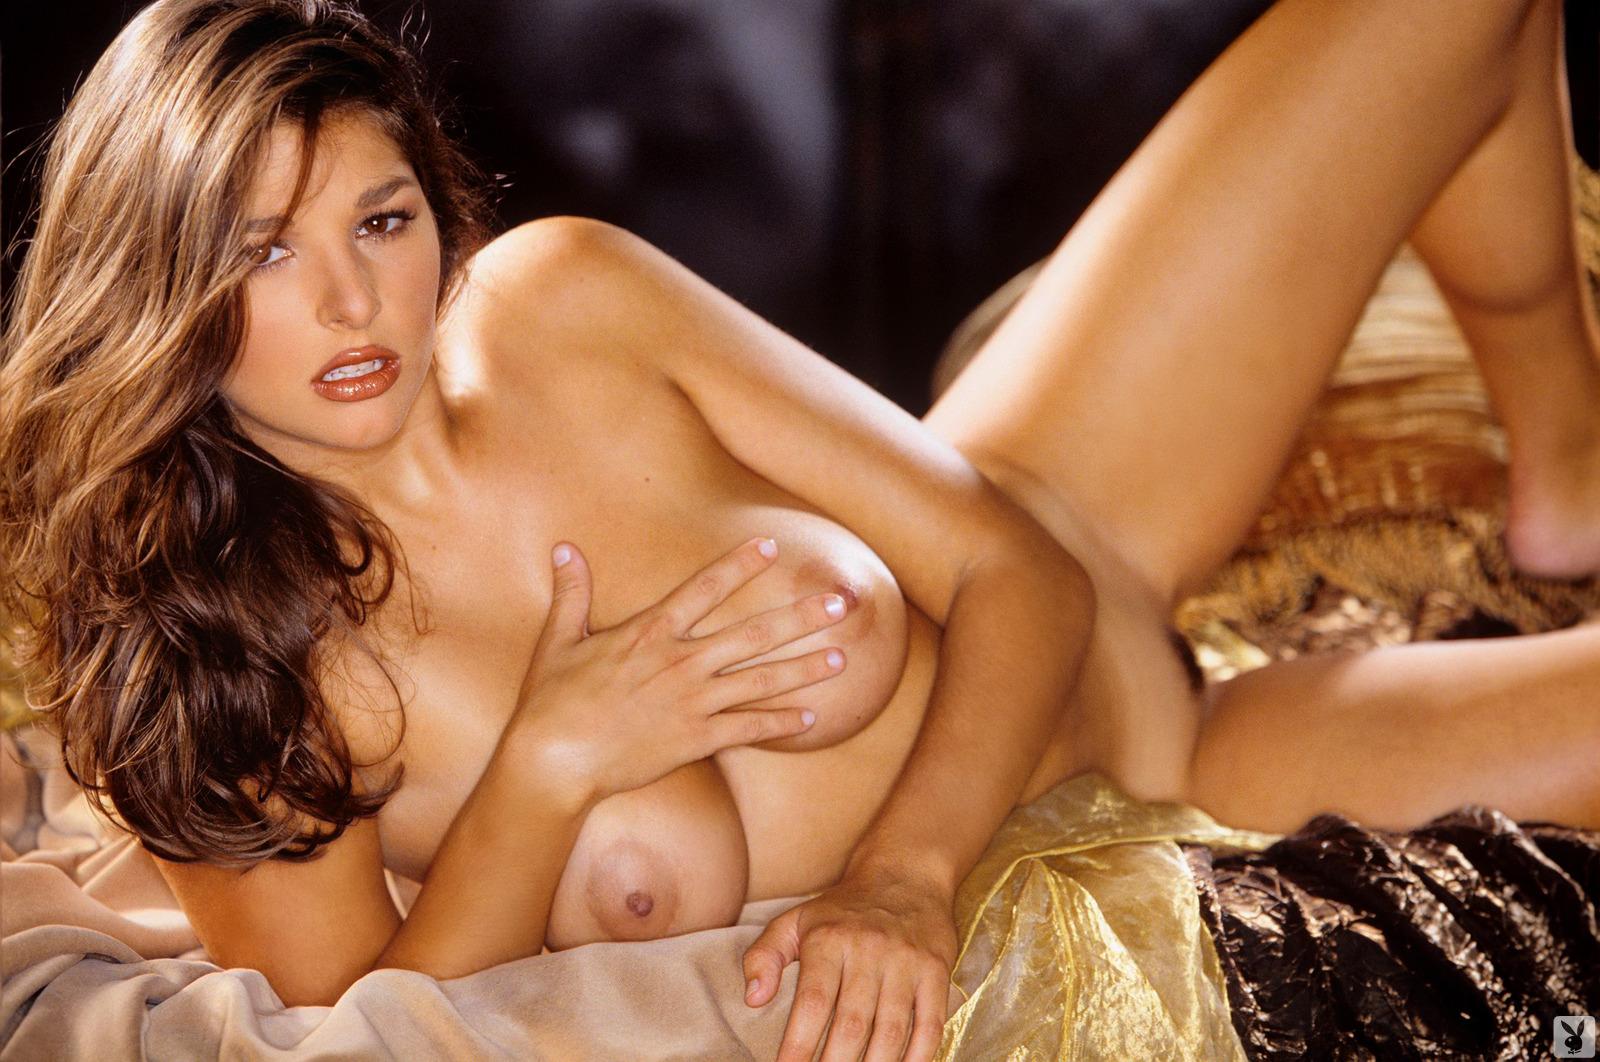 Amber kyler nude